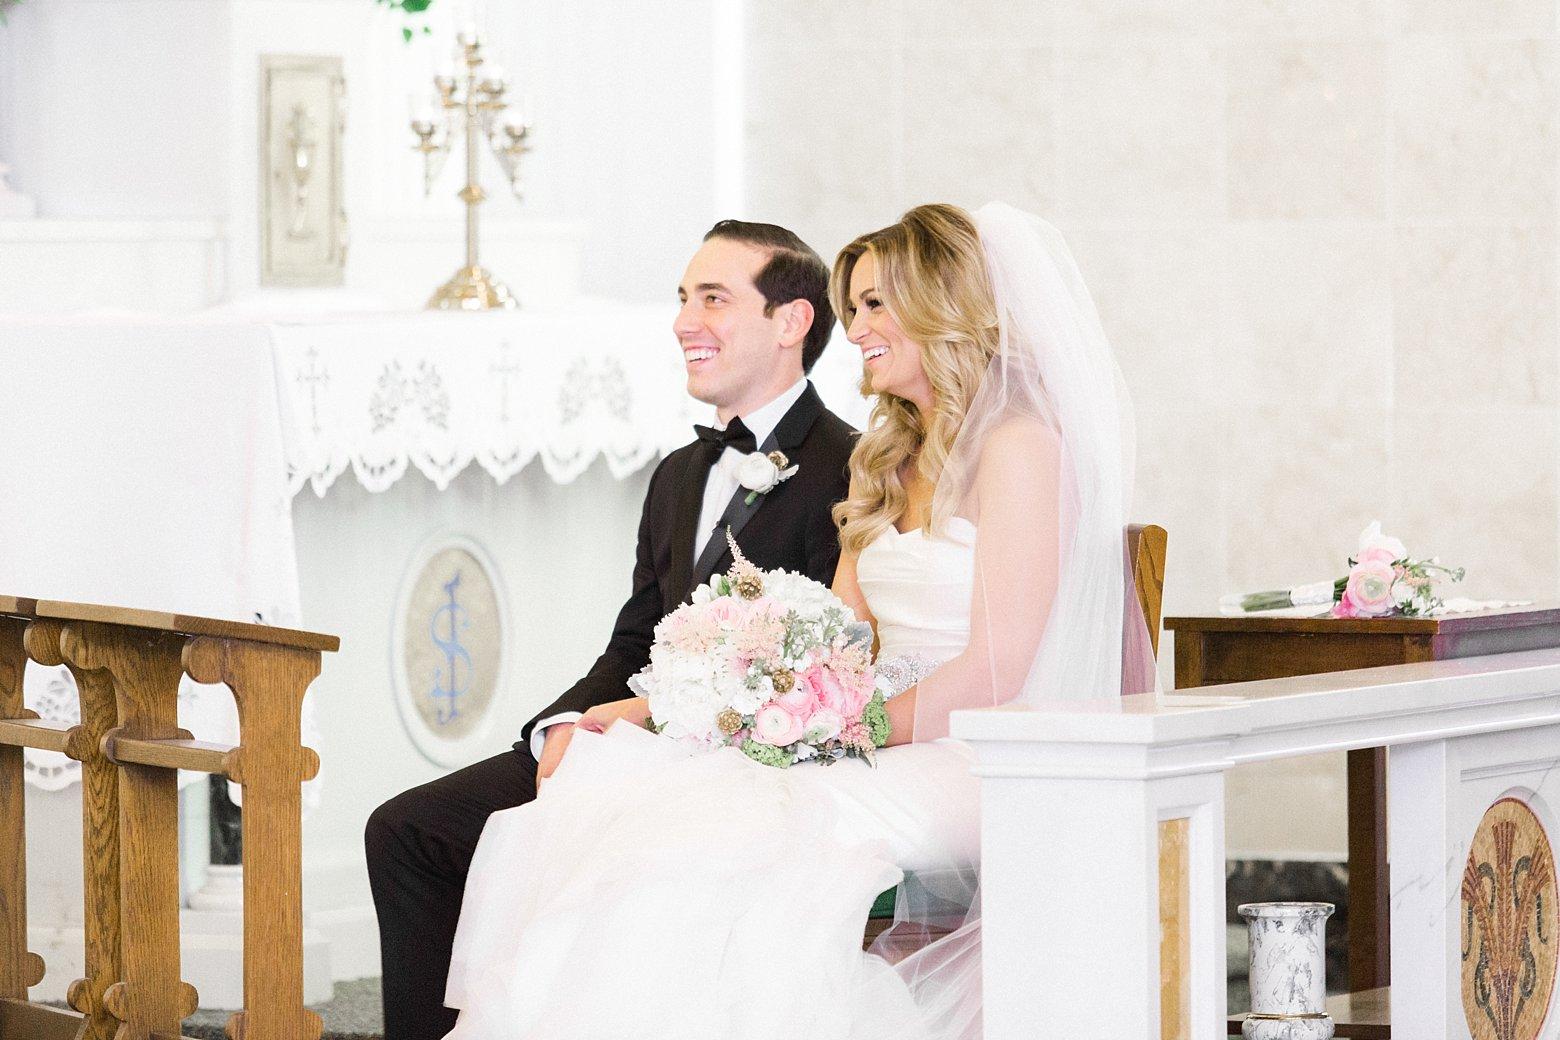 lauren_fair_photography_april_lynn_designs_stasia_matt_spring_cairnwood_estate_wedding_northeast_philadelphia_blush_pink_gold_wedding_invitation_stationery_0051